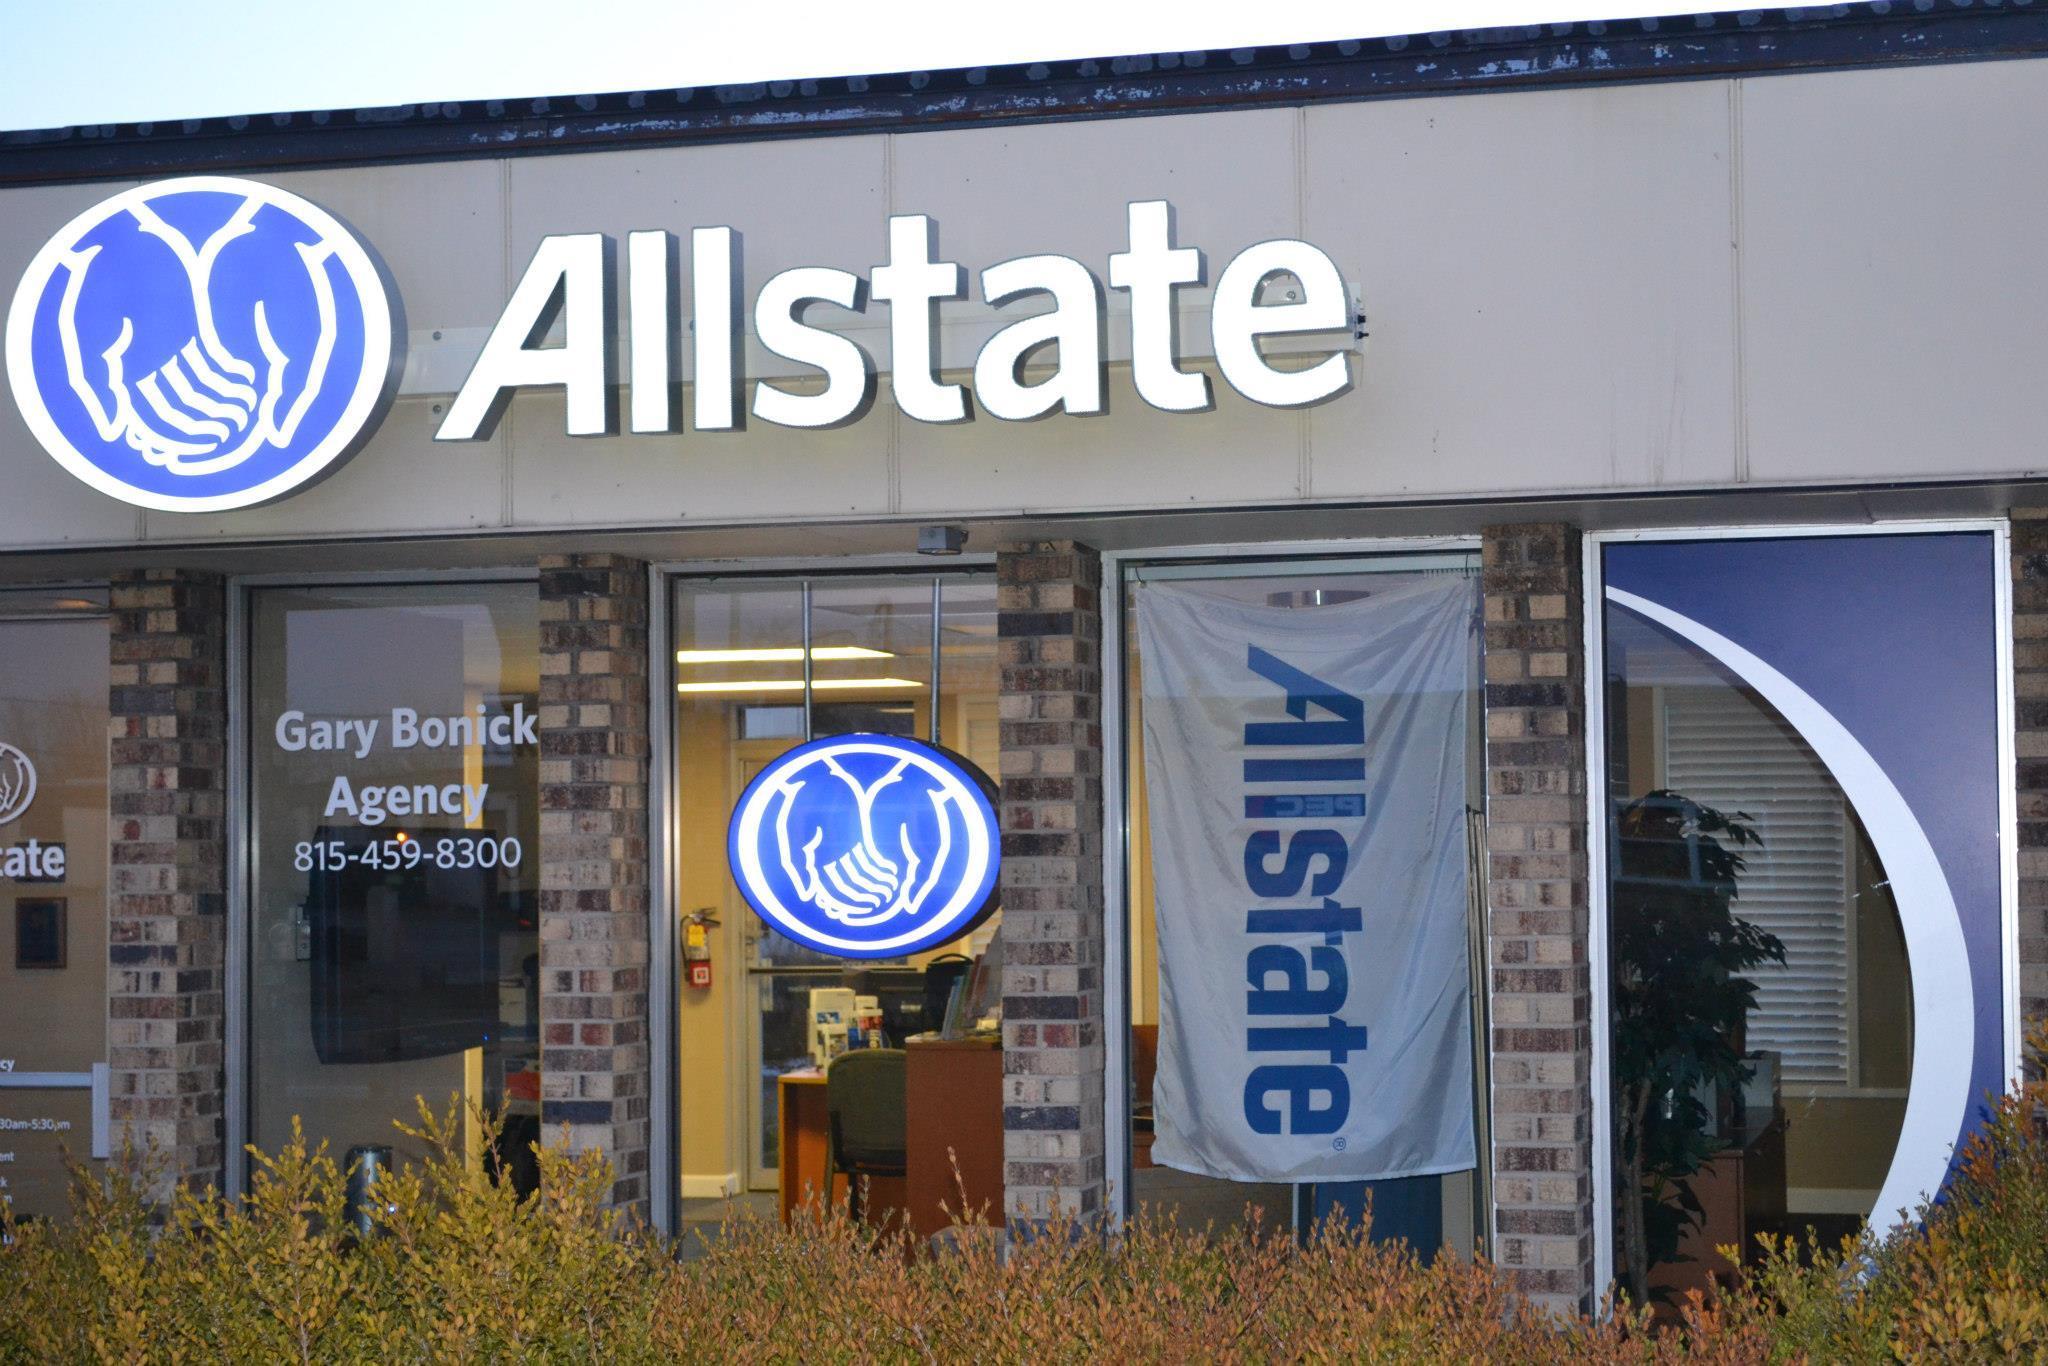 Gary Bonick: Allstate Insurance image 13